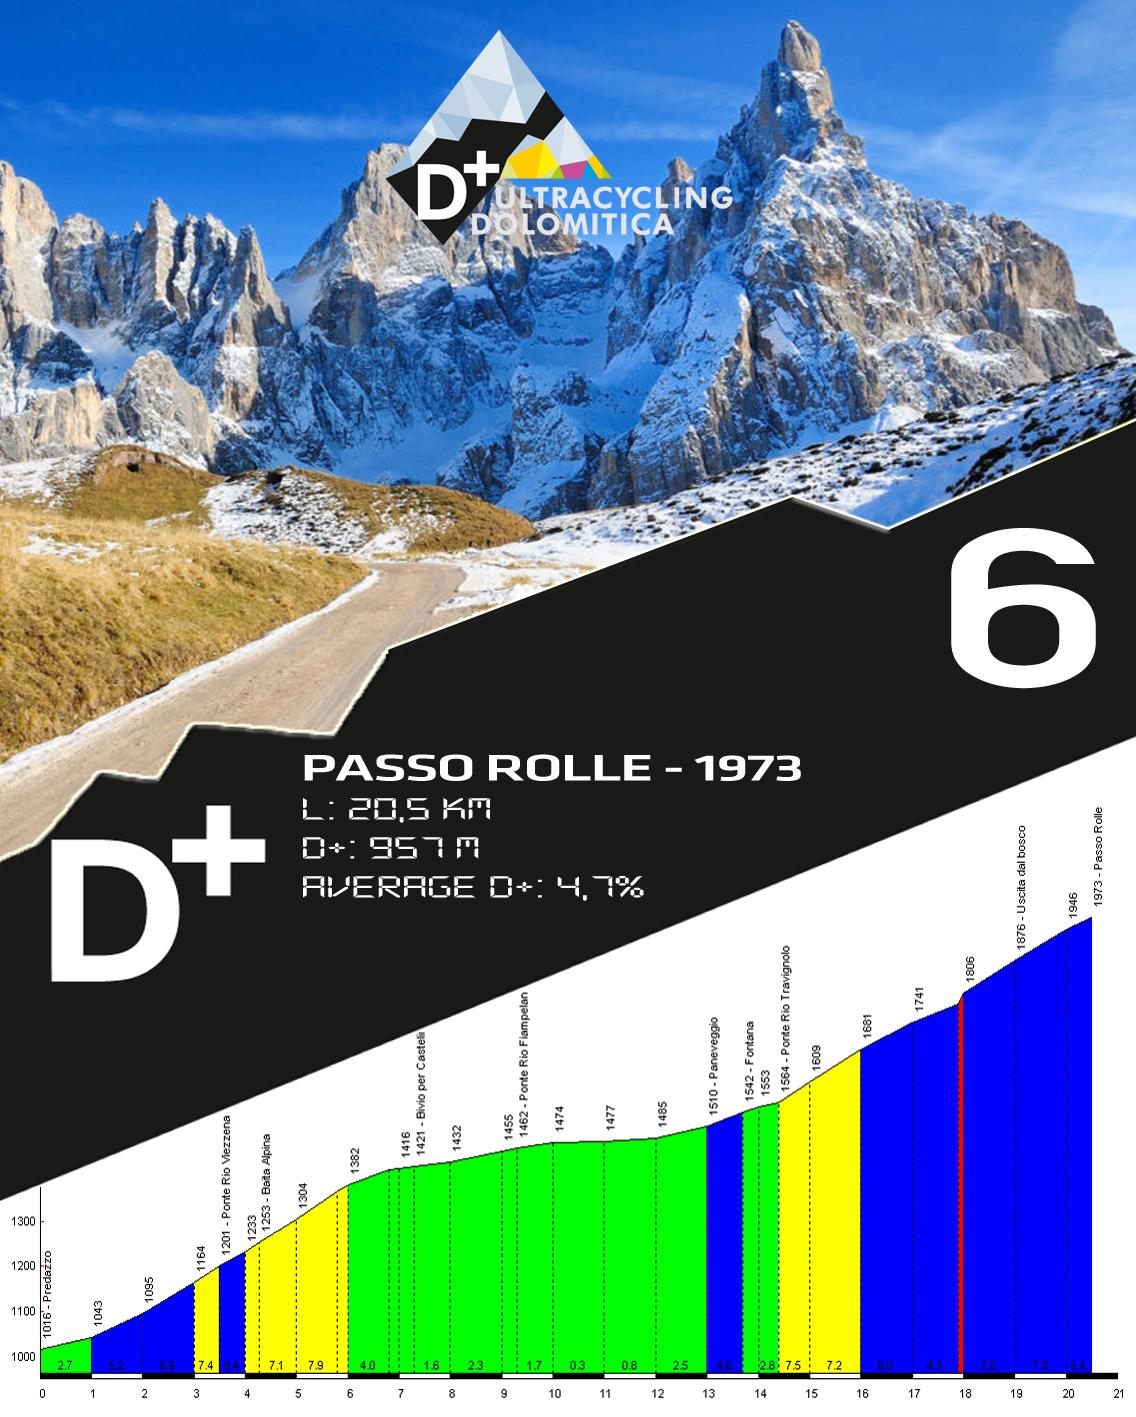 PASSO ROLLE DOLOMITICA